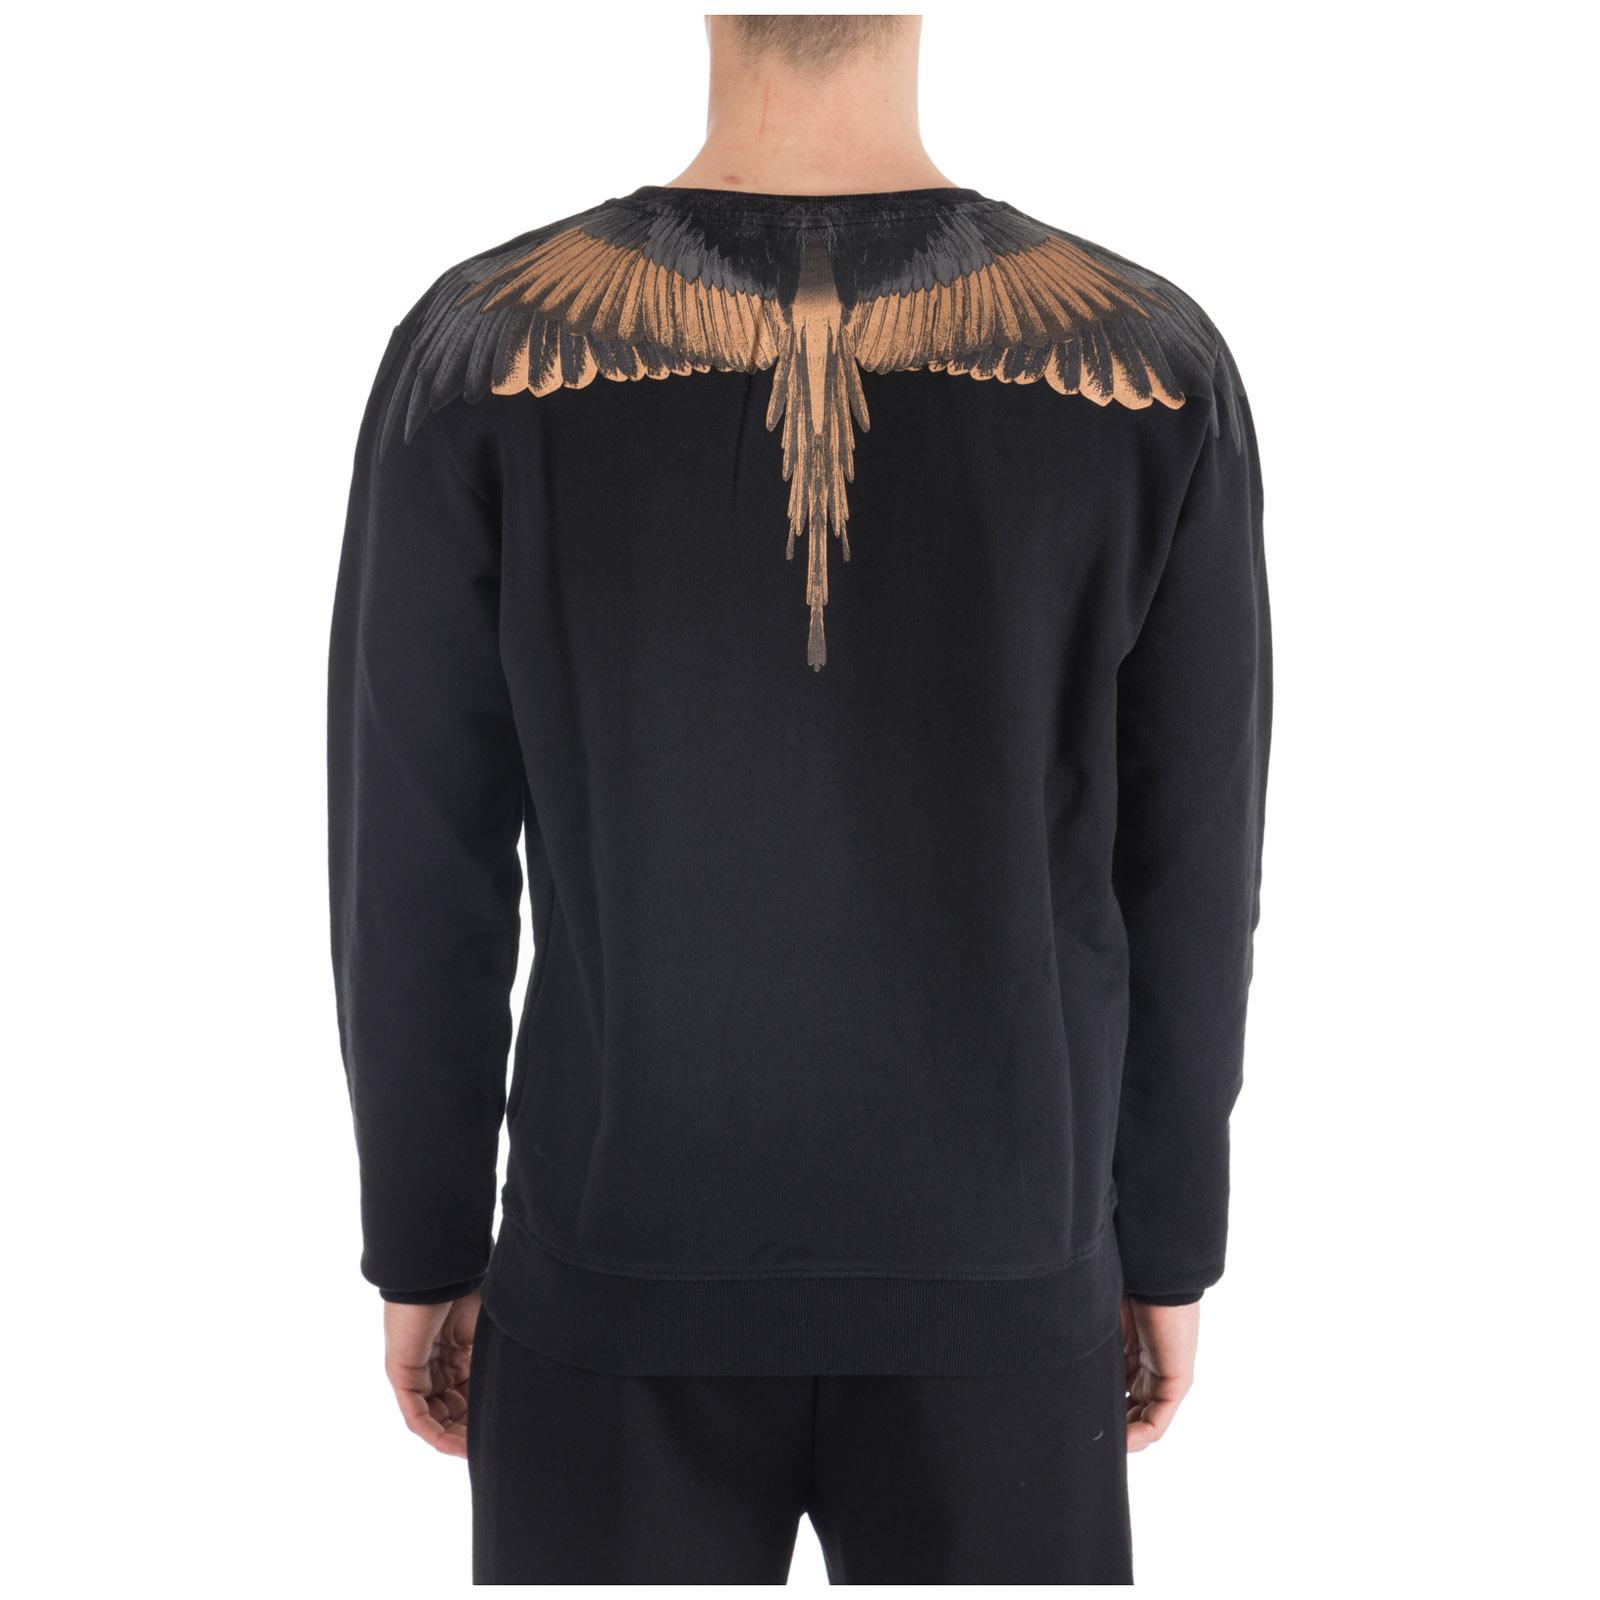 negozio online 248e9 cea21 Felpa uomo wings